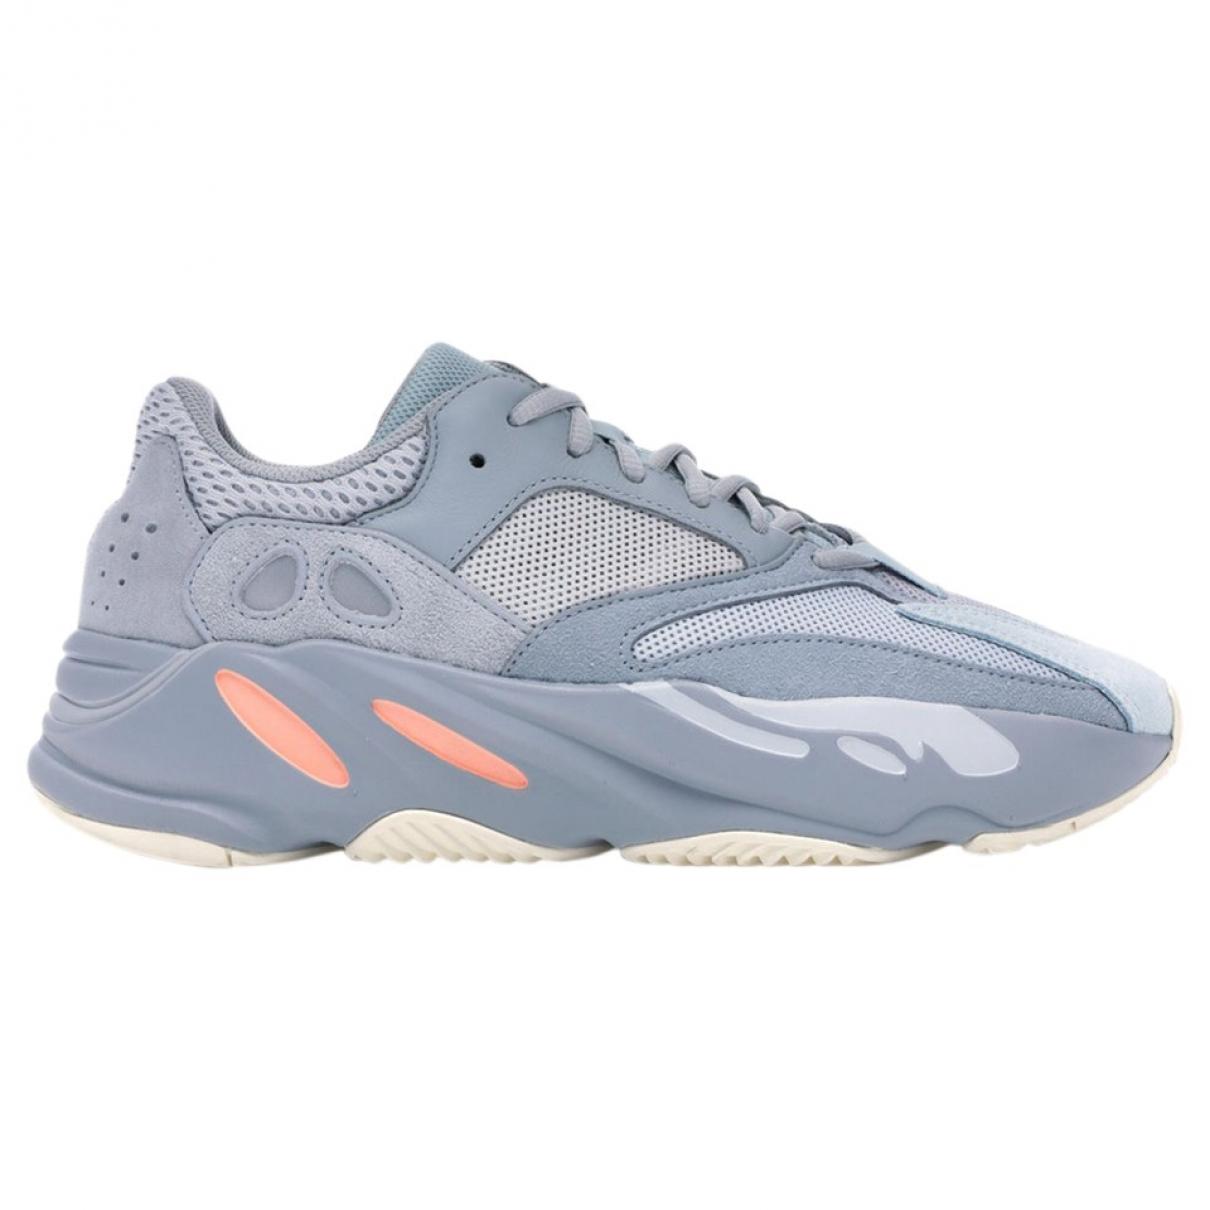 Yeezy X Adidas - Baskets Boost 700 V2 pour femme en suede - bleu